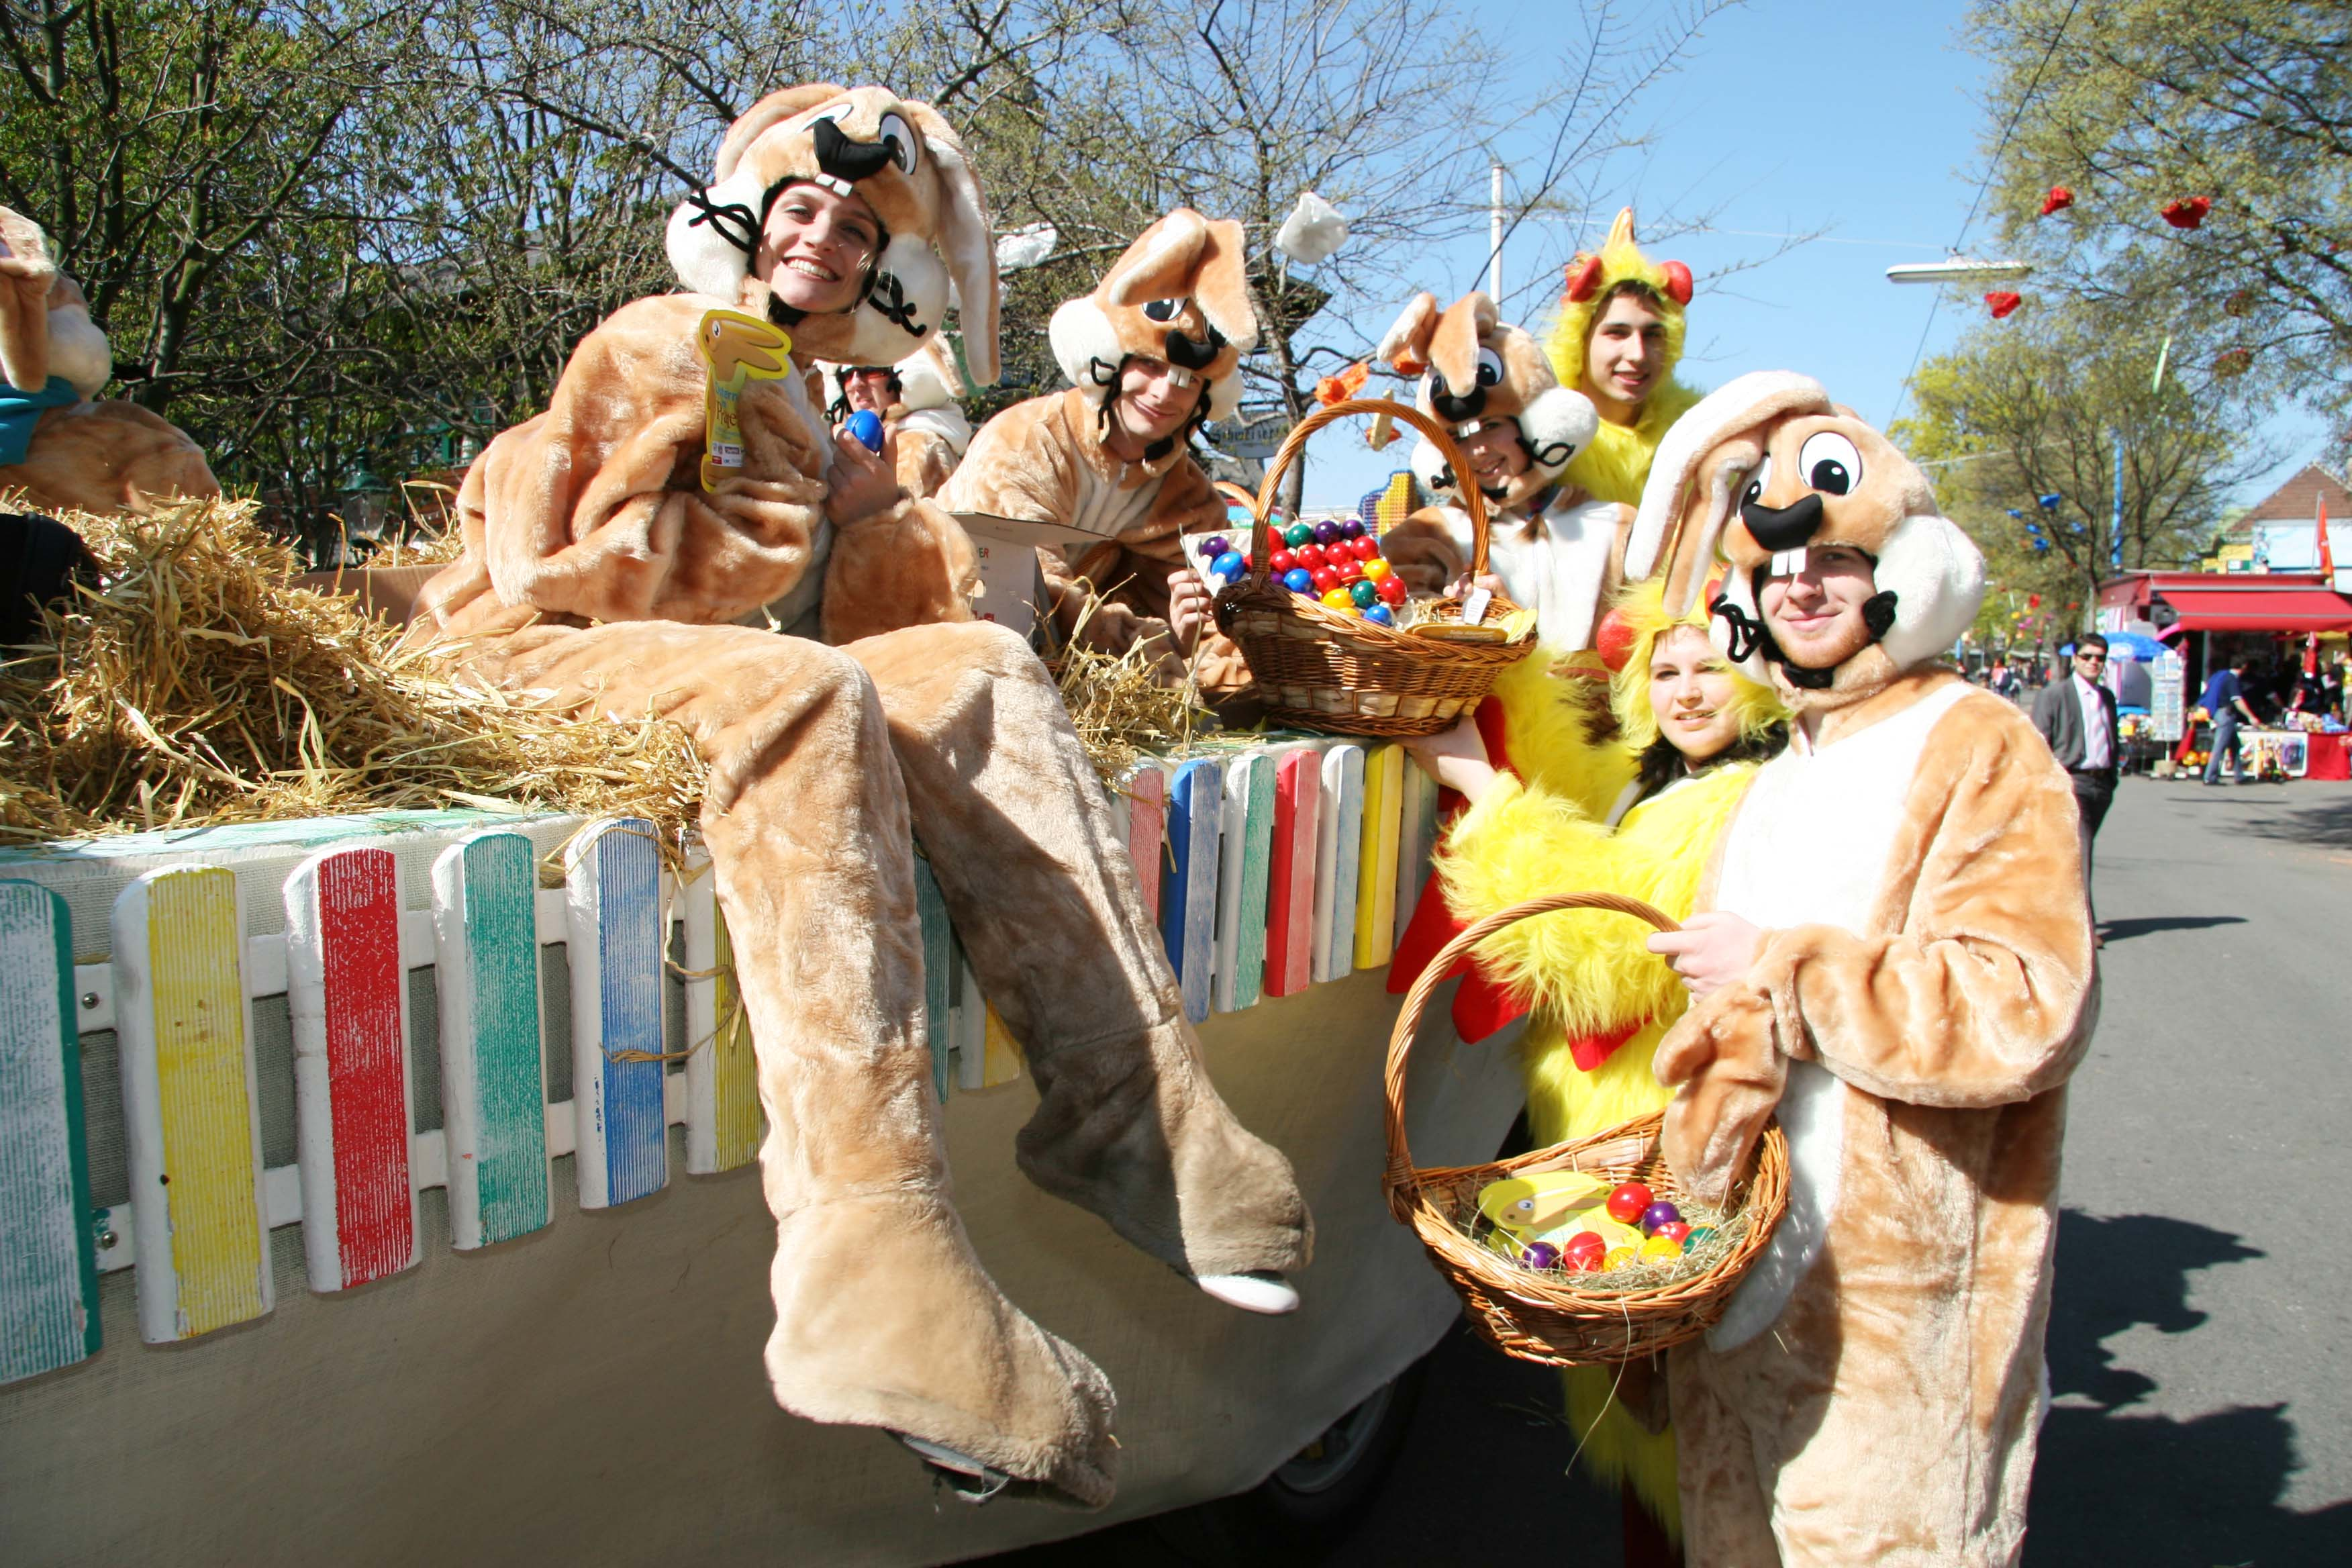 Easter, Prater, Easter bunnies, Vienna, Hostel Vienna, Prater Easter, Easter festival Vienna